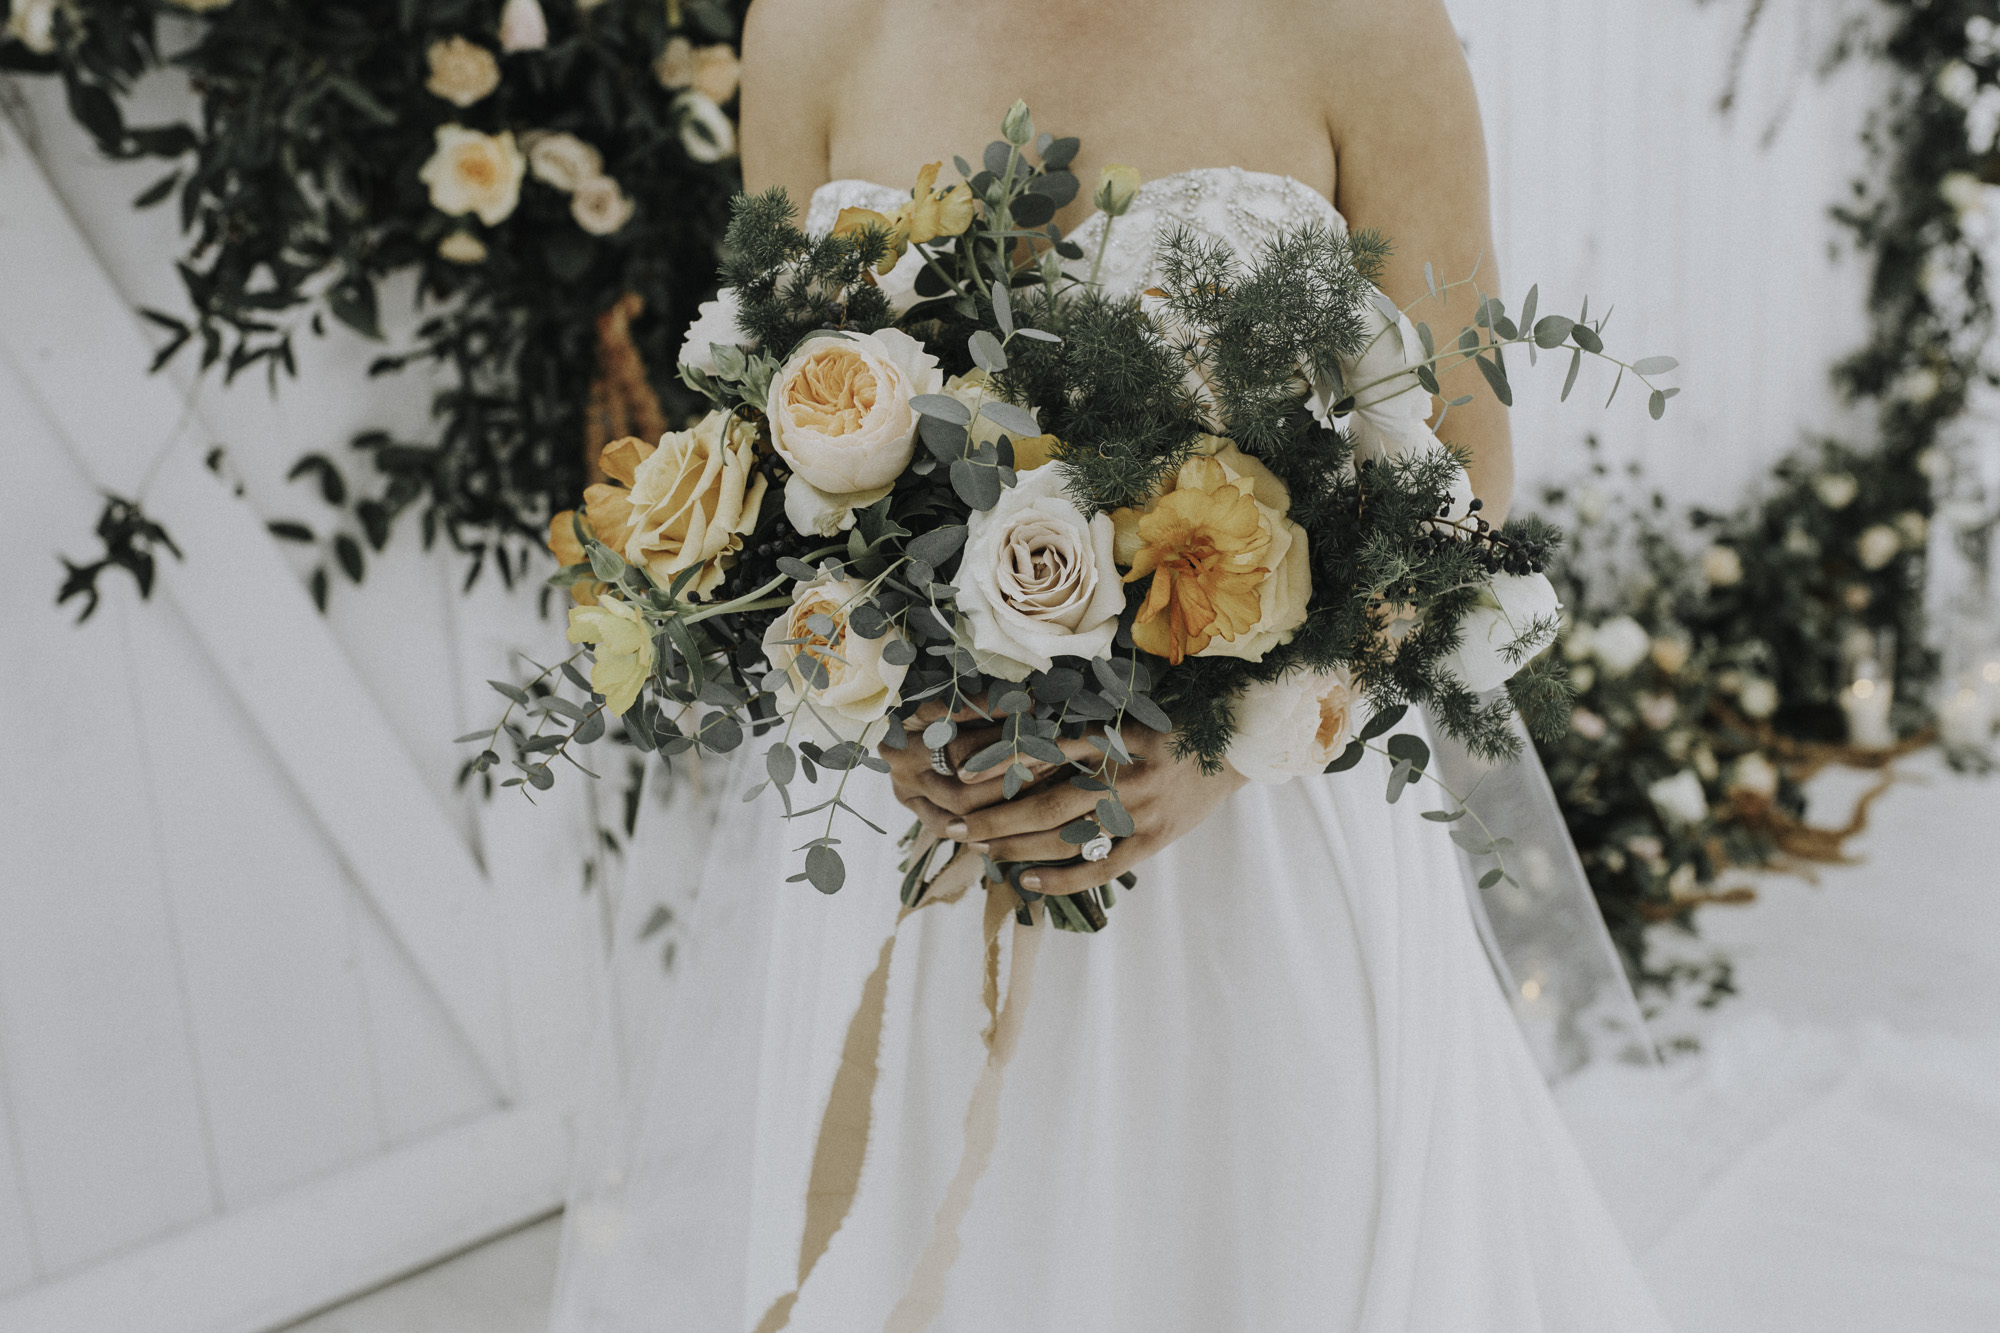 Cate_Ann_Photography_Dayton_Ohio_Wedding_Elopement_And_Engagement_PhotographerIMG_7932.jpg